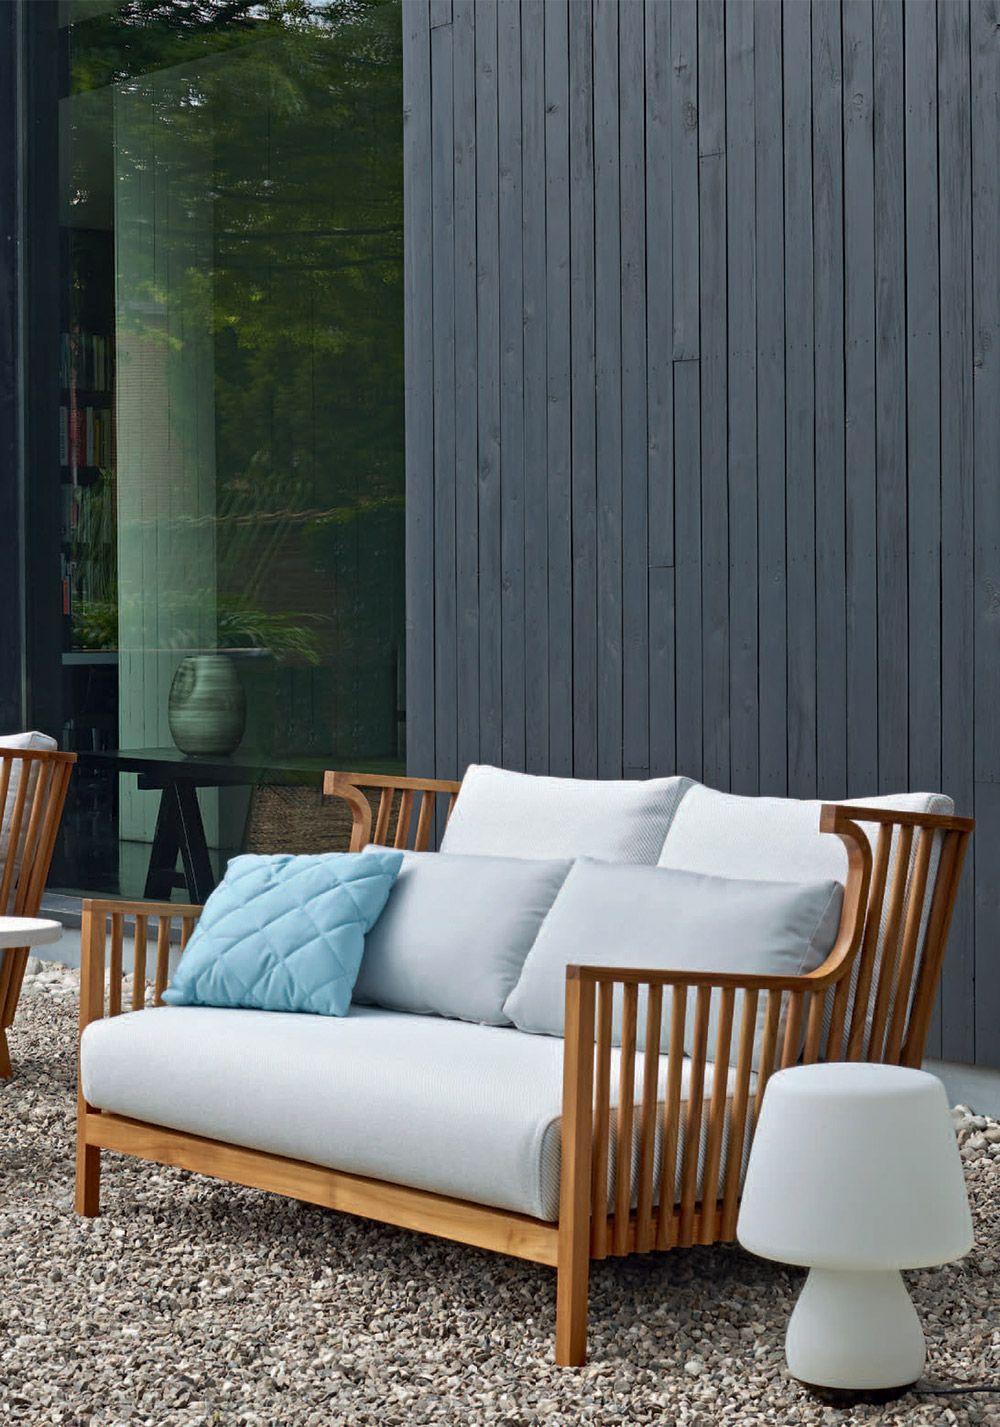 Elizabeth Loveseat Designed By Nathan Yong For Ligne Roset Available At Linea Inc Modern Furniture Los Angeles Info